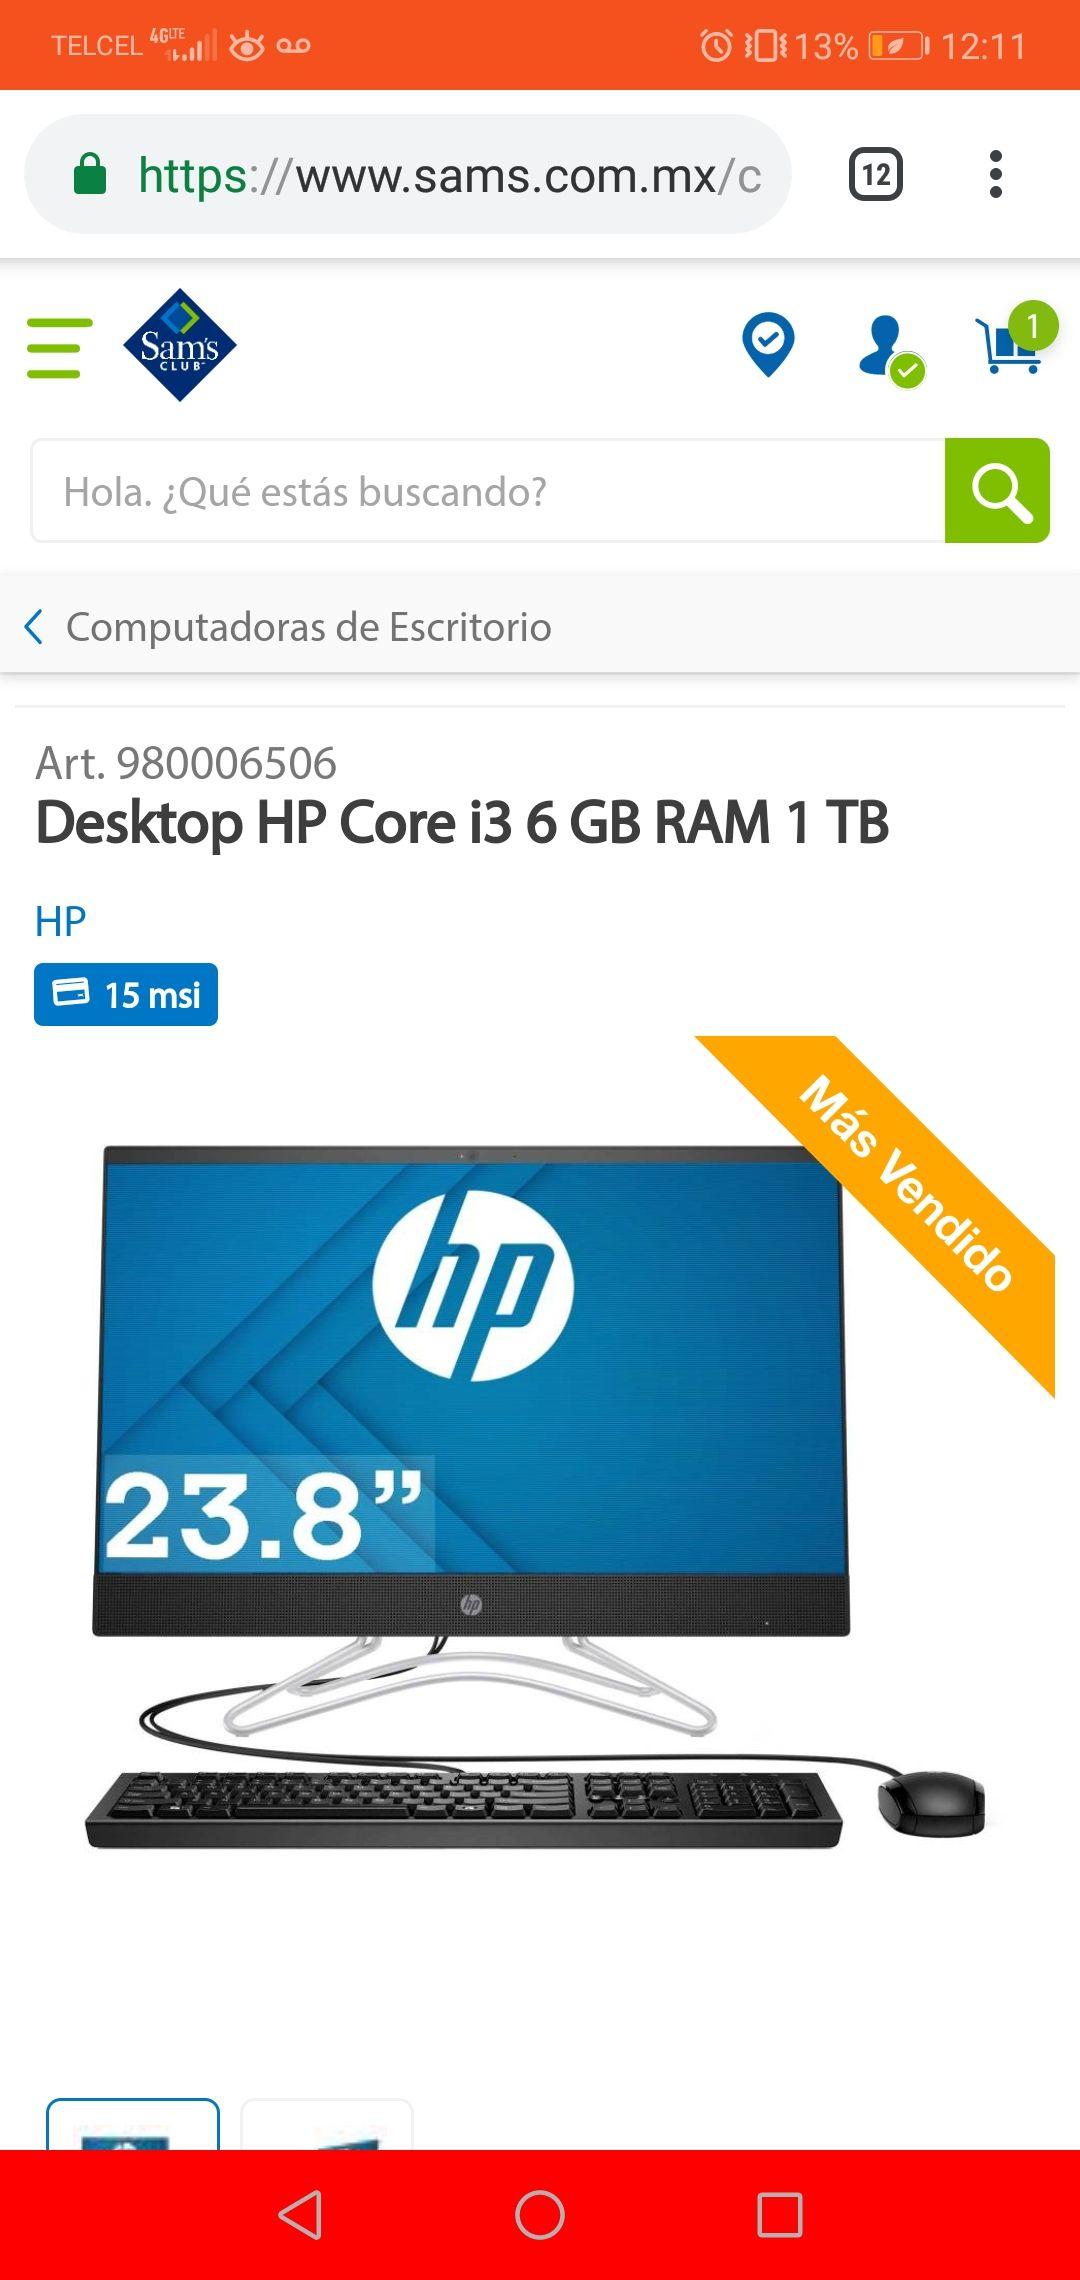 "Sam's Club: Hp 23,8"" Core i3 6 ram"